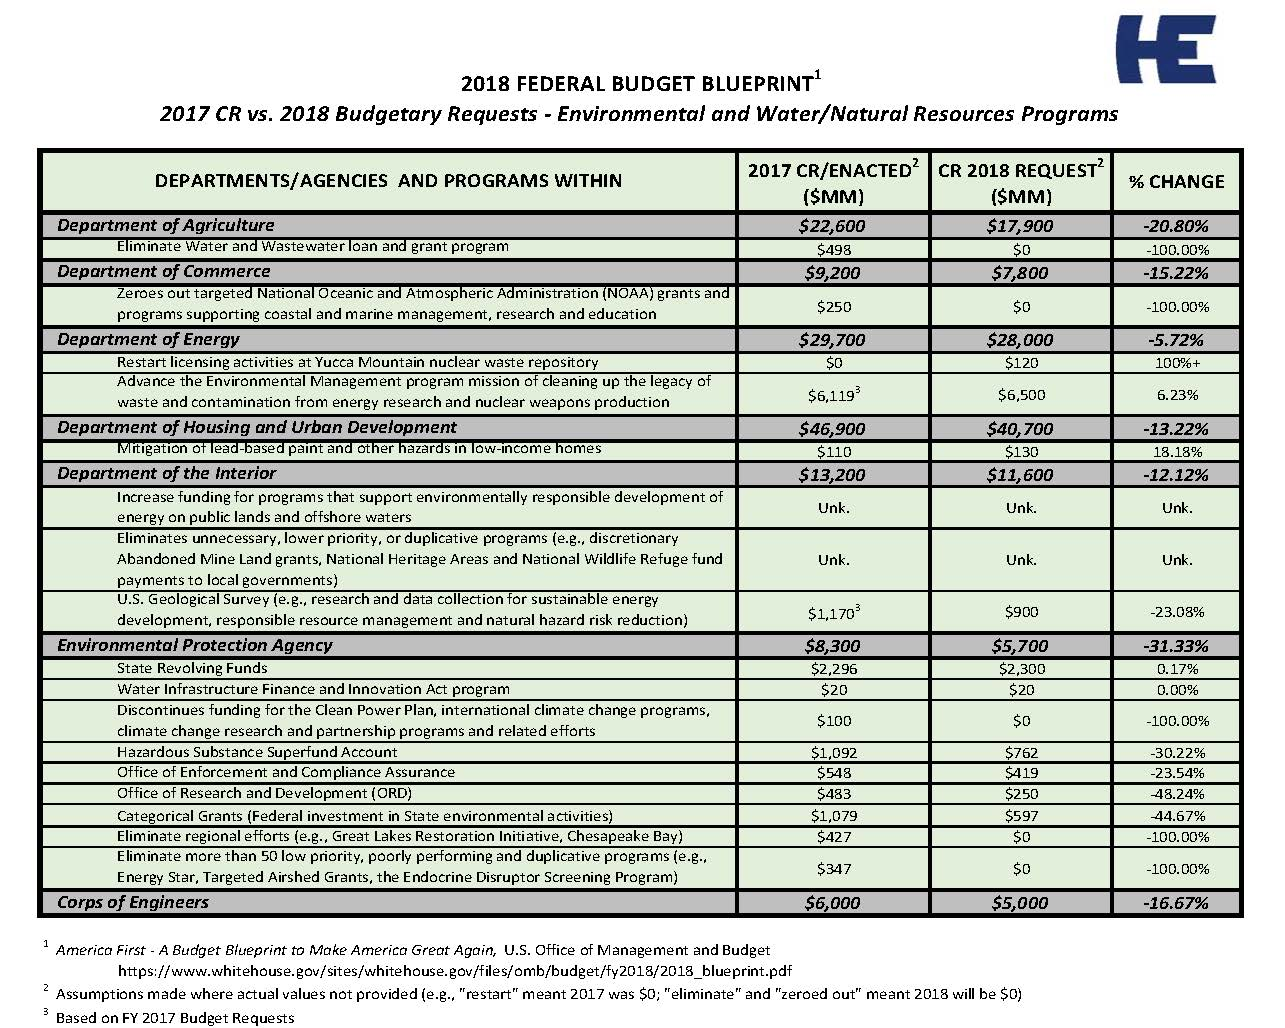 32017 how might 2018 budget blueprint impact environmental 32017 how might 2018 budget blueprint impact environmental programs malvernweather Images